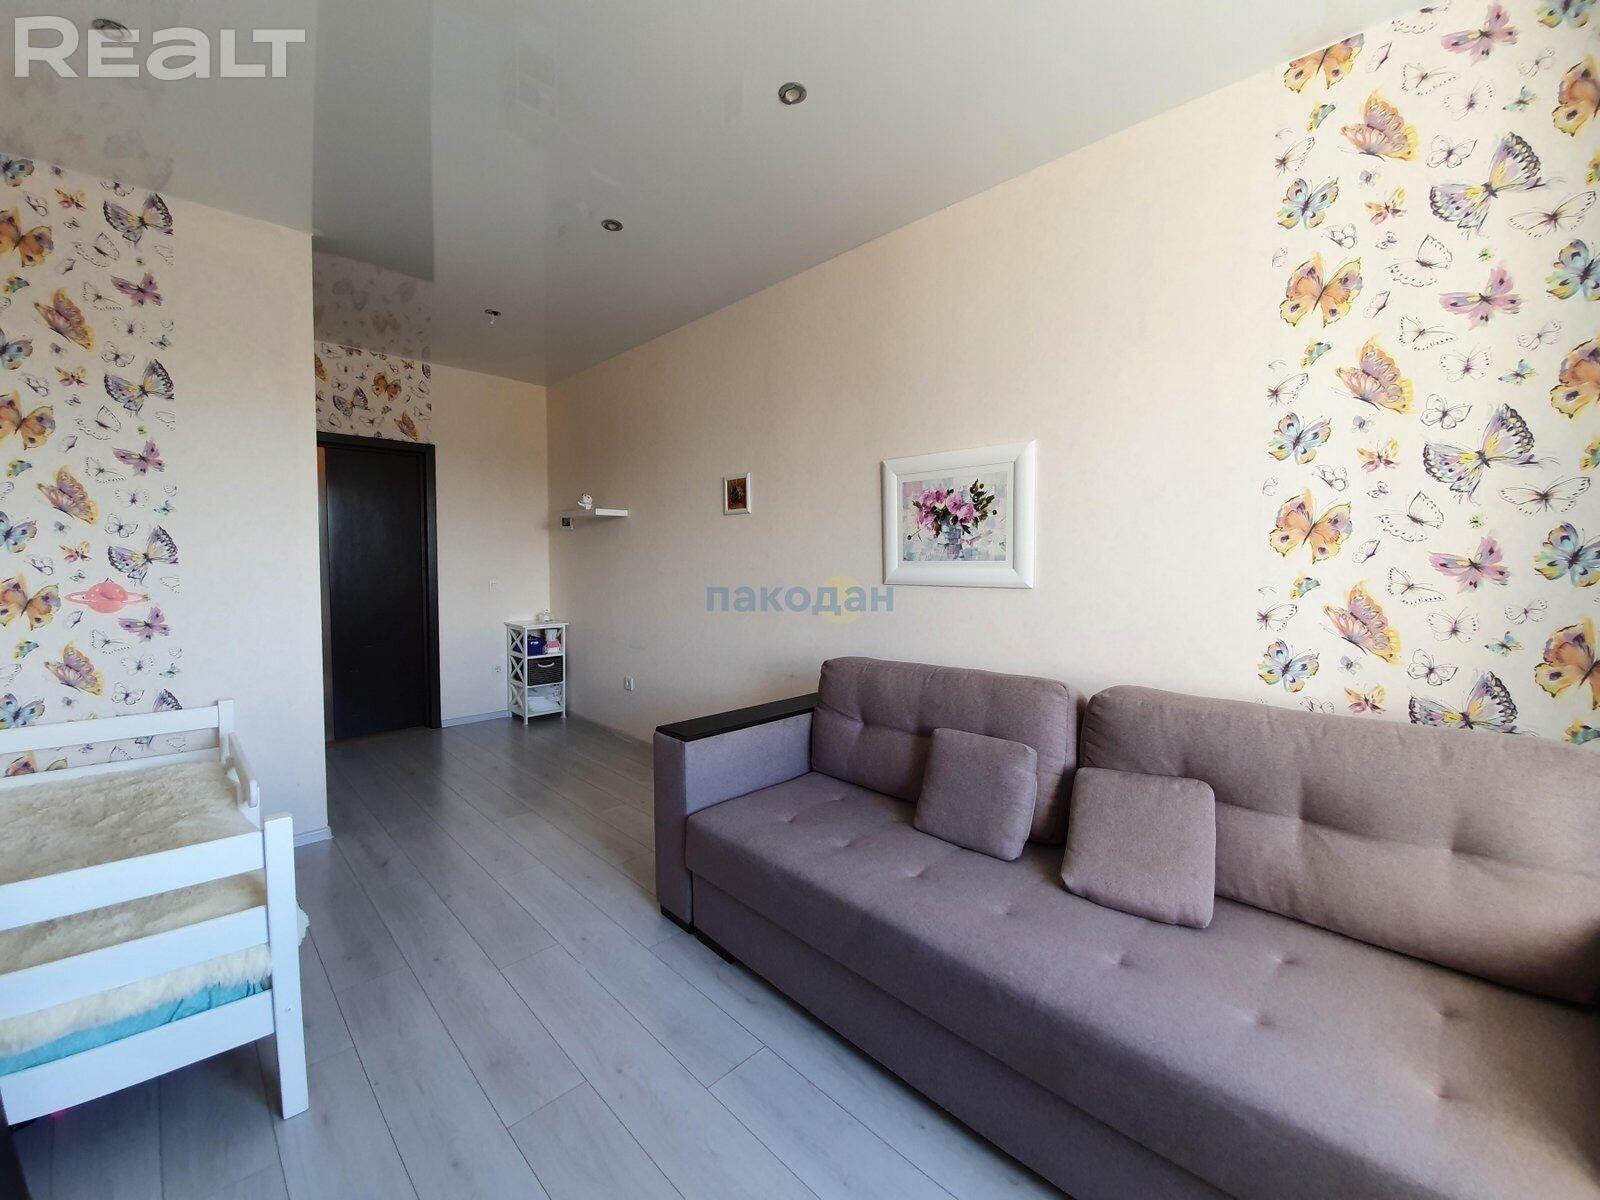 Продается 2-х комнатная квартира, Копище - фото №14